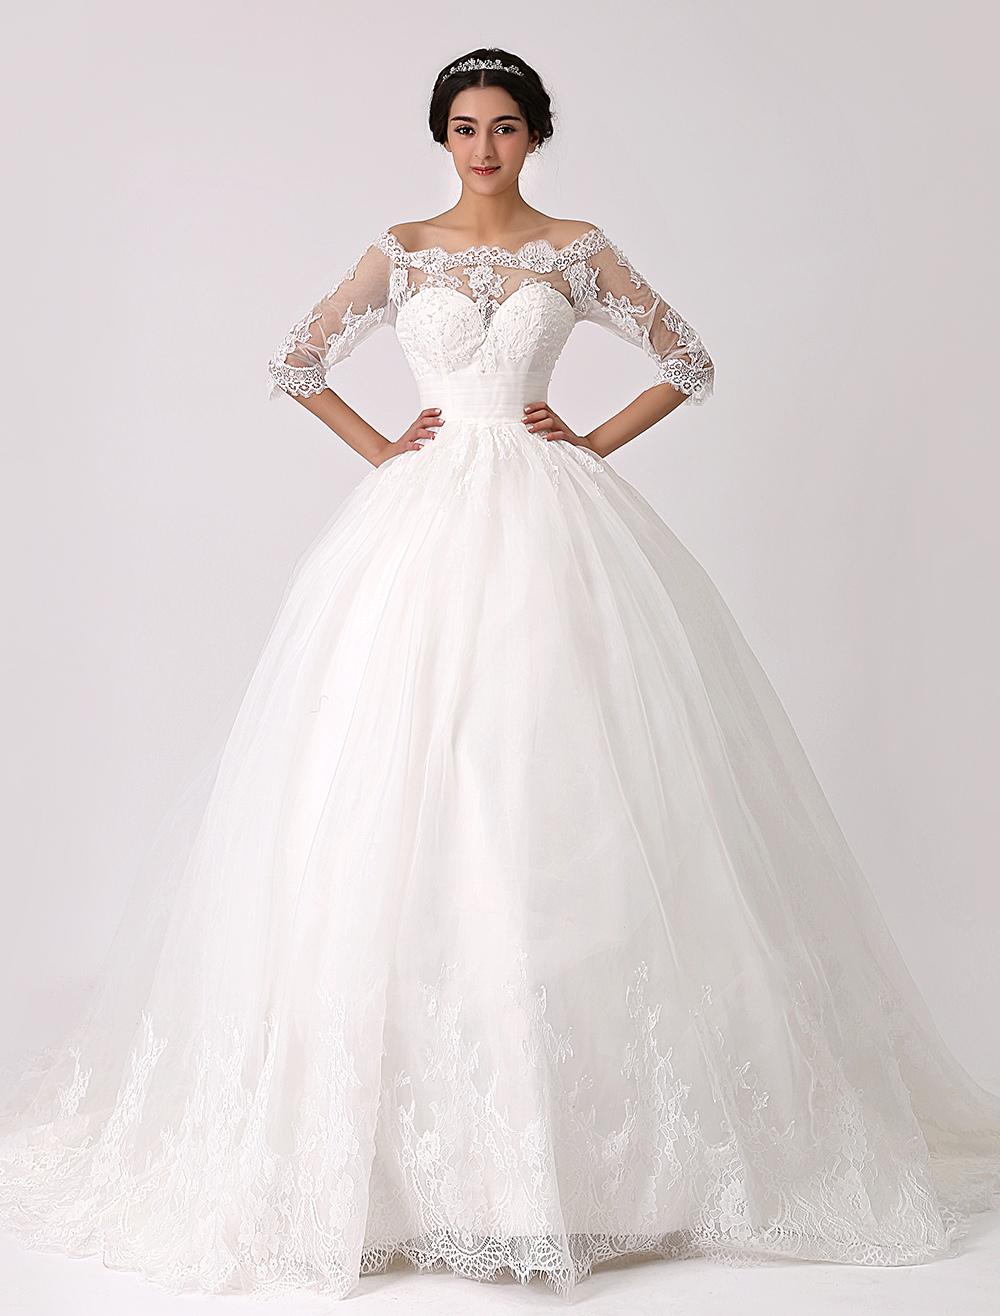 Off the Shoulder Princess Lace Wedding Dress with Illusion Neckline Milanoo